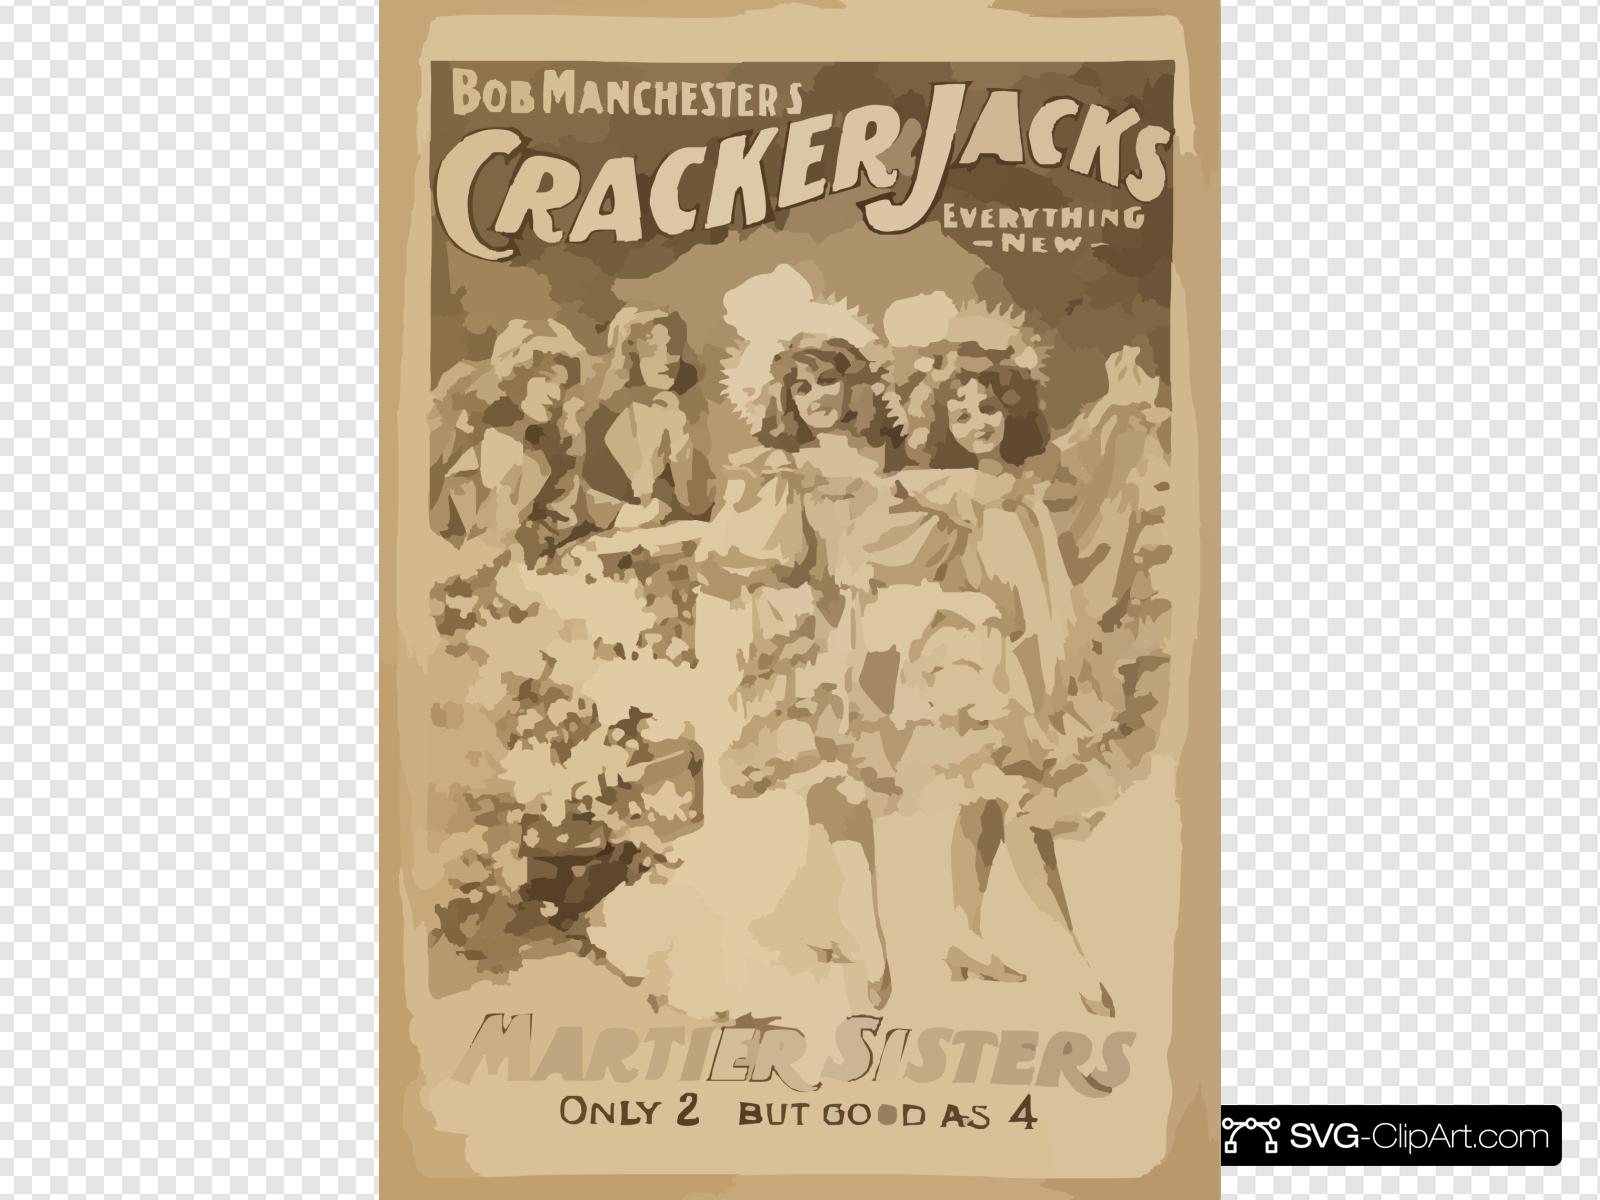 Bob Manchester S Cracker Jacks Everything New. Clip art.